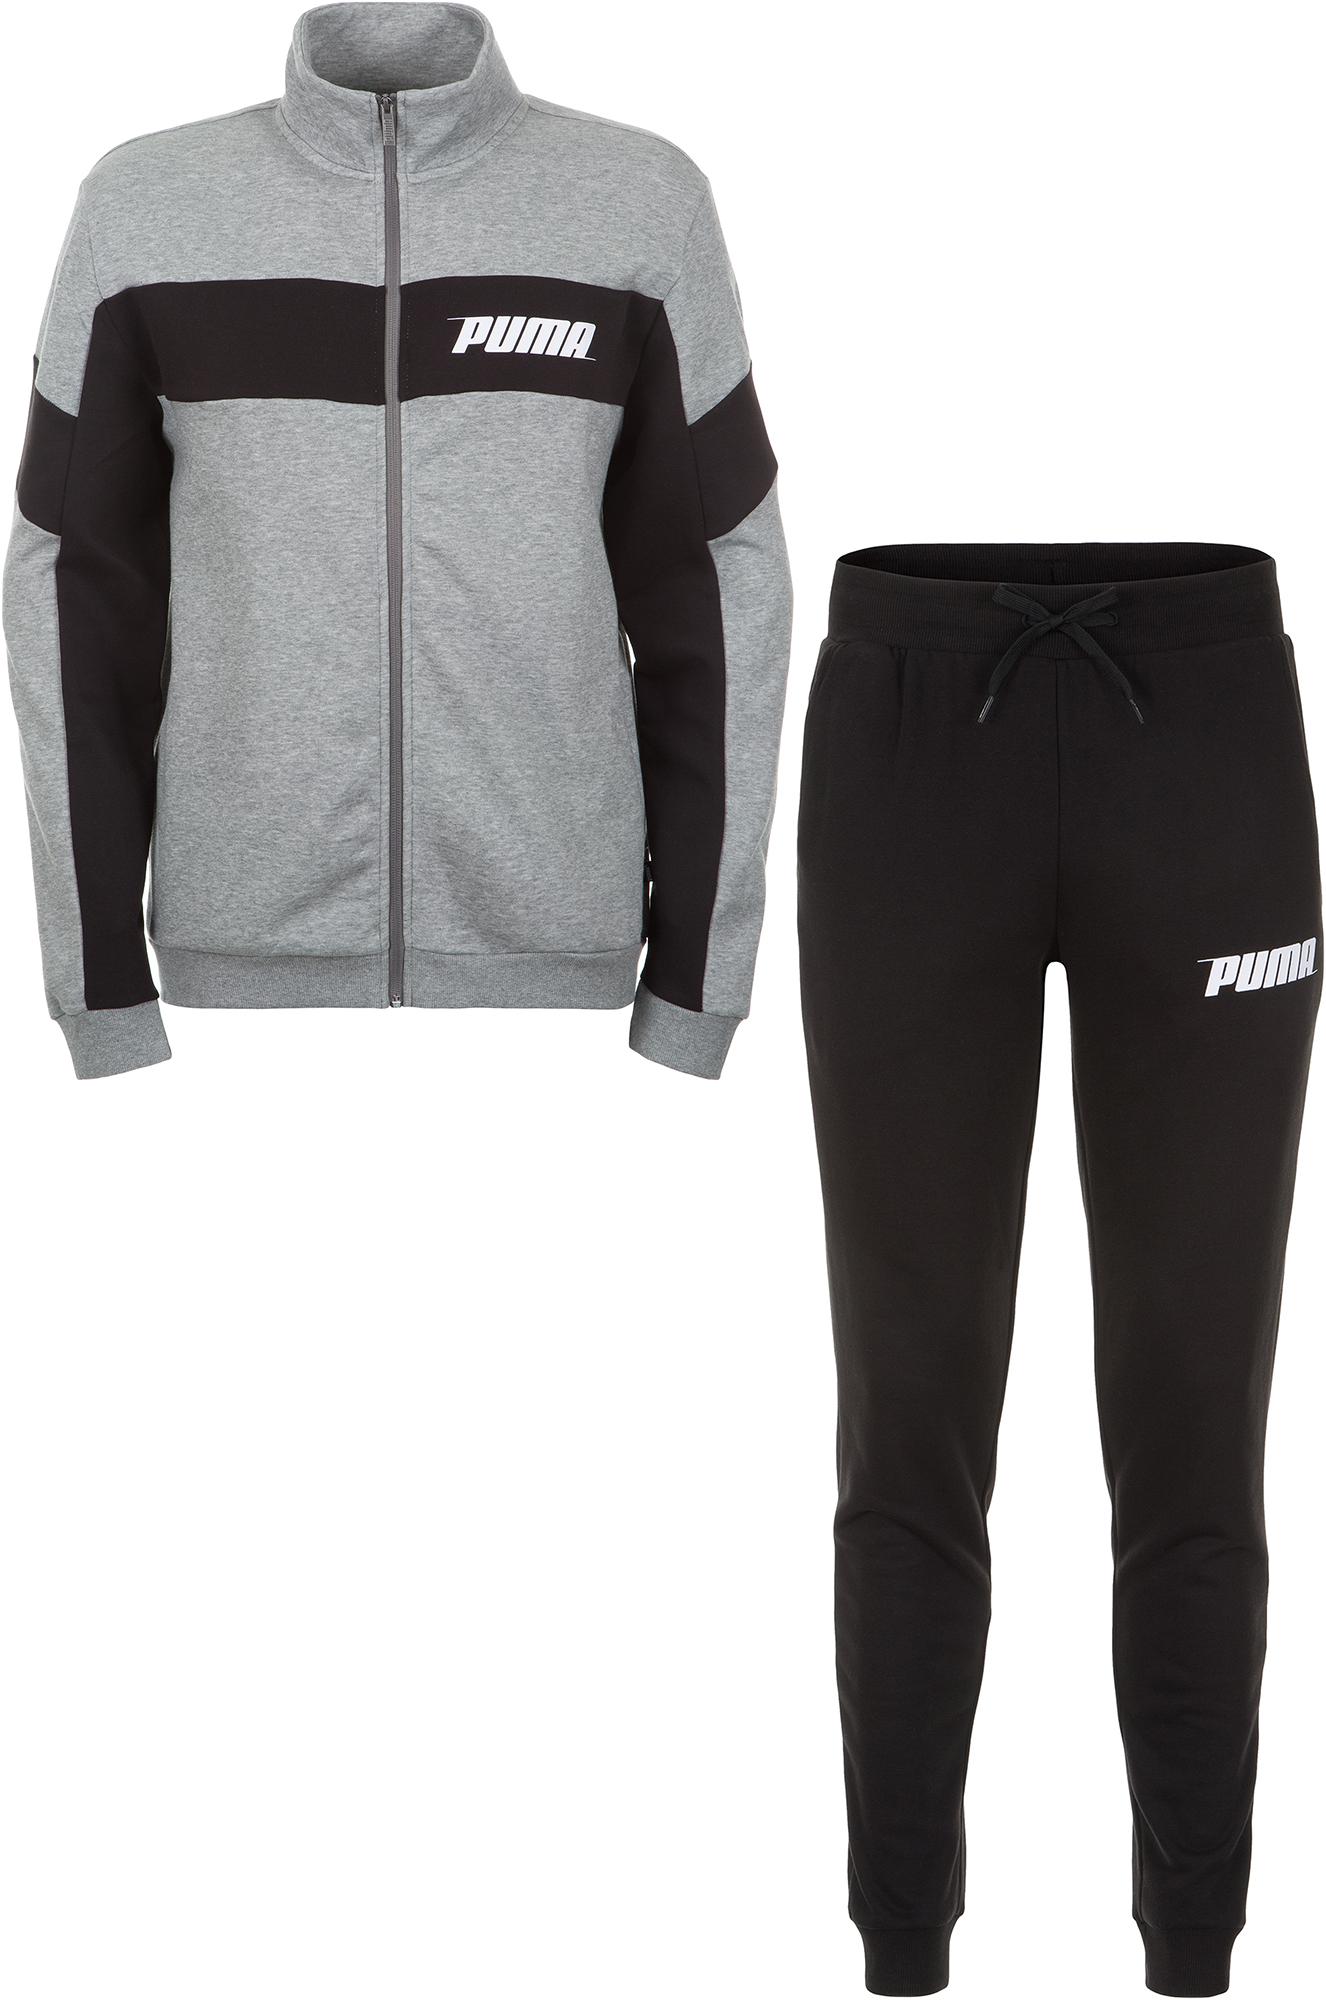 Puma Костюм спортивный мужской Puma Rebel, размер 50-52